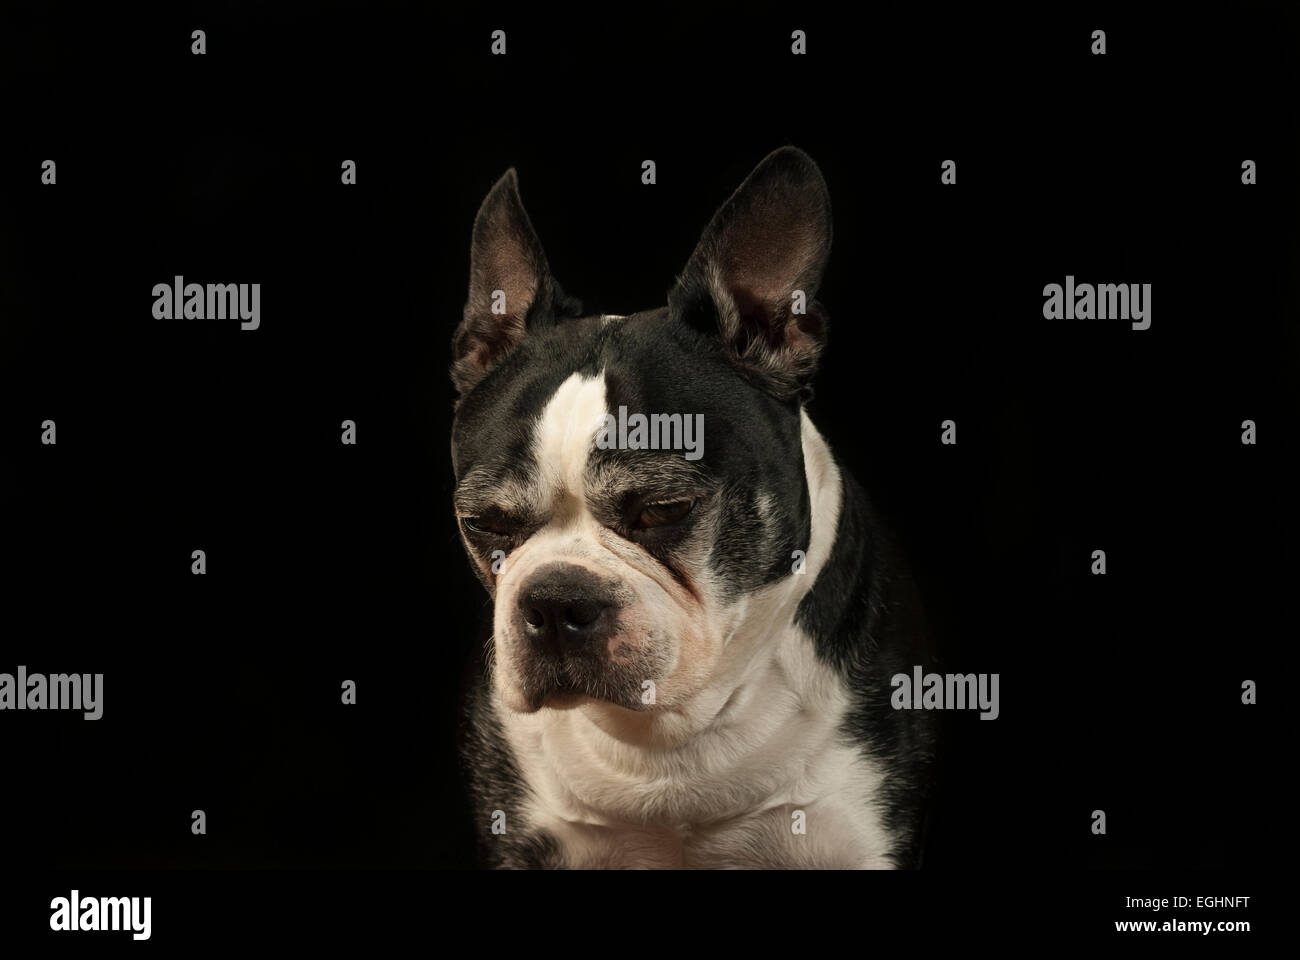 Boston Terrier at the studio - Stock Image